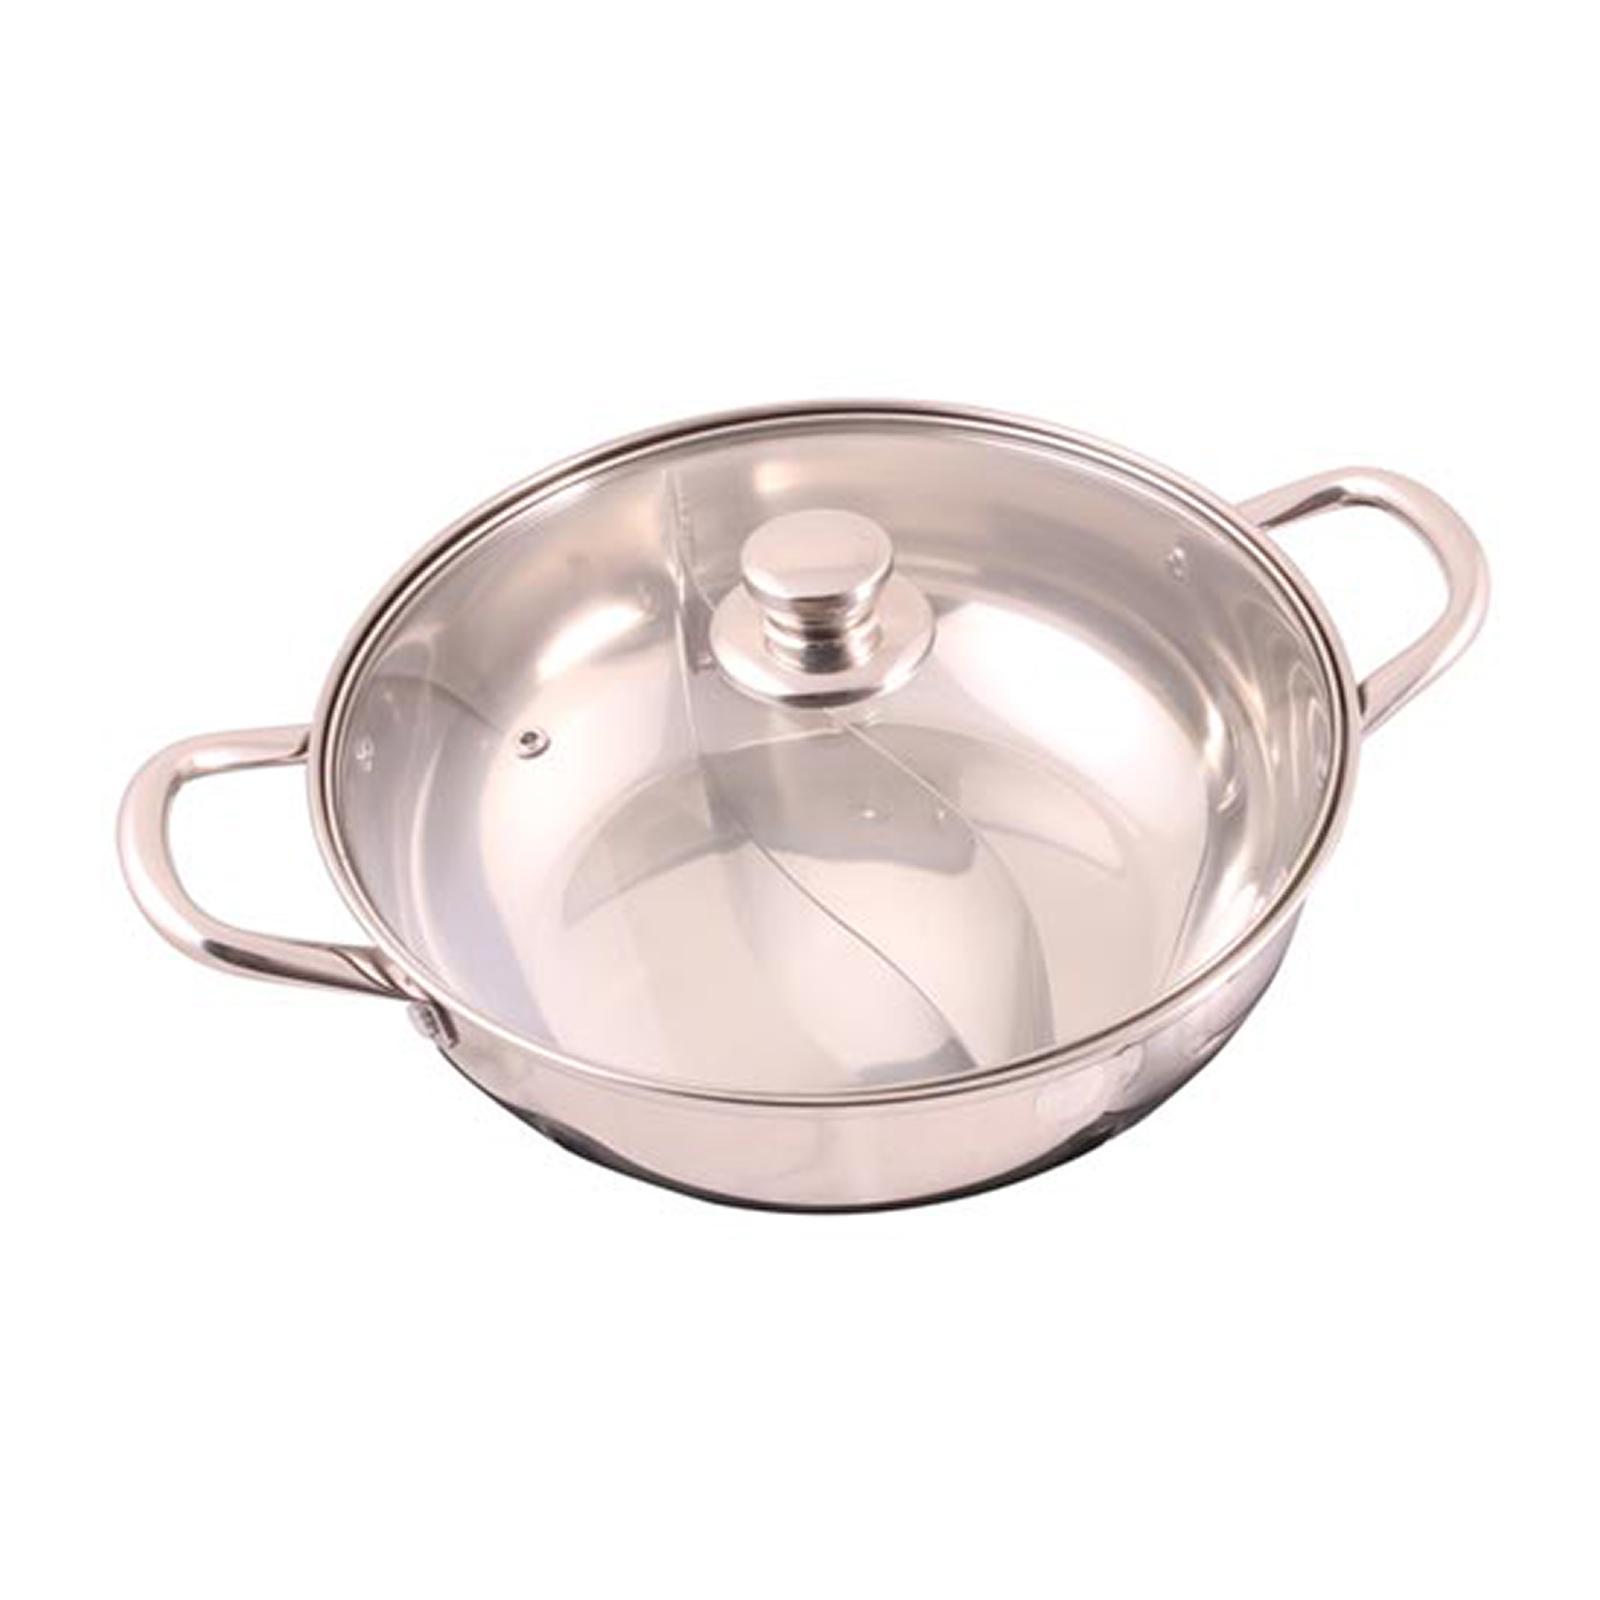 ToTT Divided Shabu Shabu Hot Pot With Glass Lid 28Cm - By ToTT